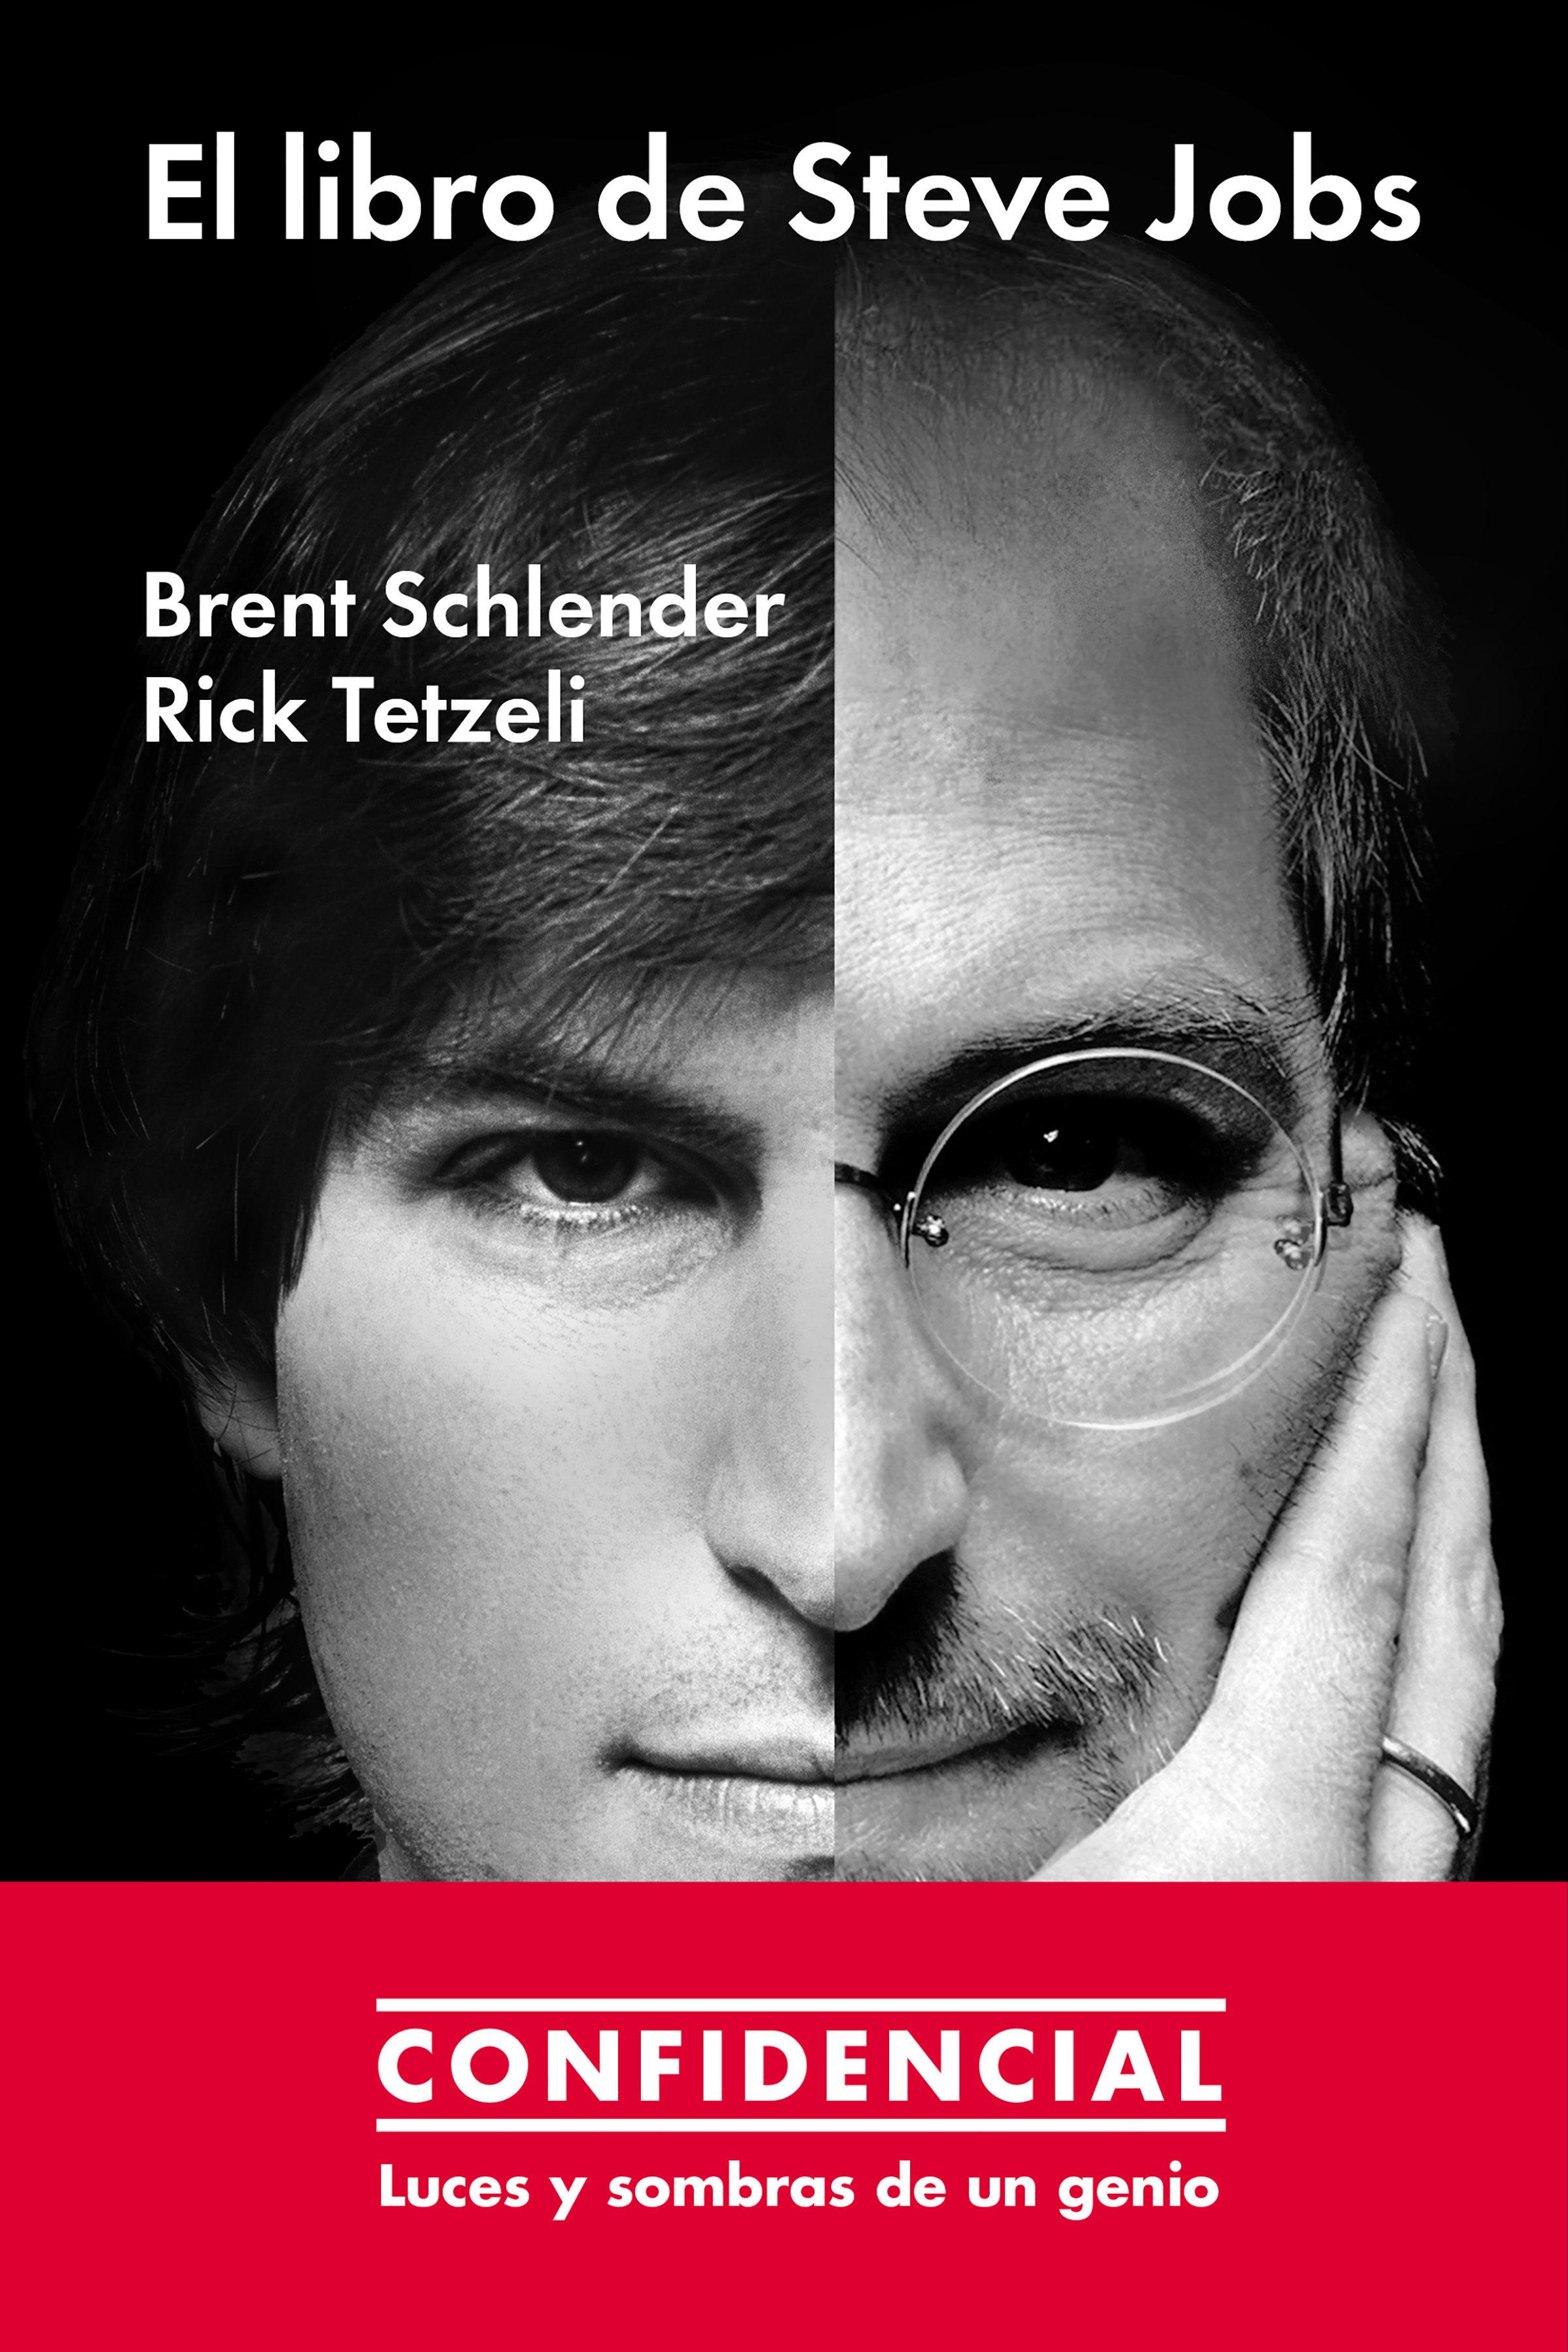 El libro de steve jobs ebook brent schlender rick tetzeli 9788416420575